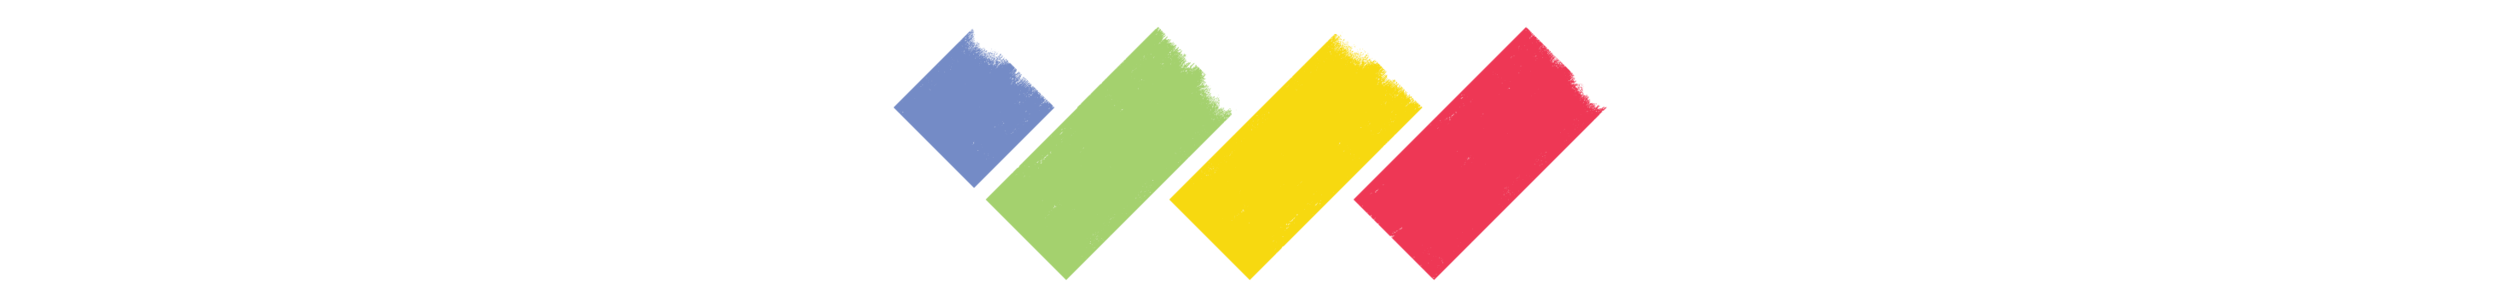 VW_logo_long_thin-01.png